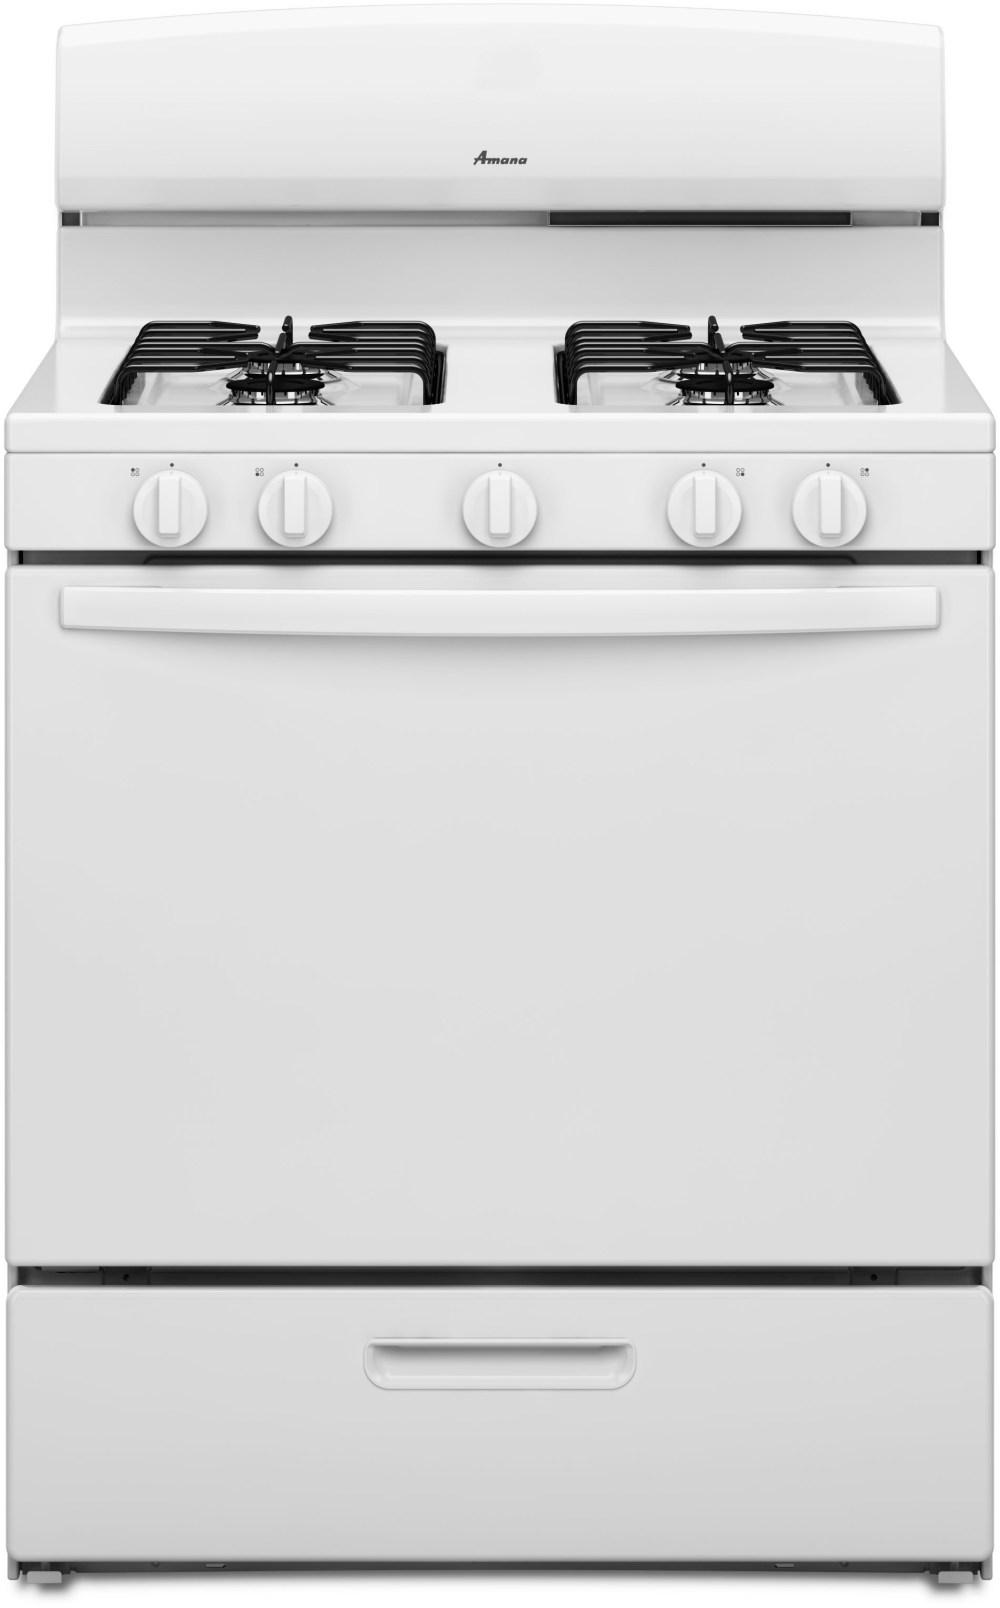 medium resolution of amana gas stove wiring diagram wiring diagrams click reznor wiring diagrams amana agr4230baw 30 inch freestanding